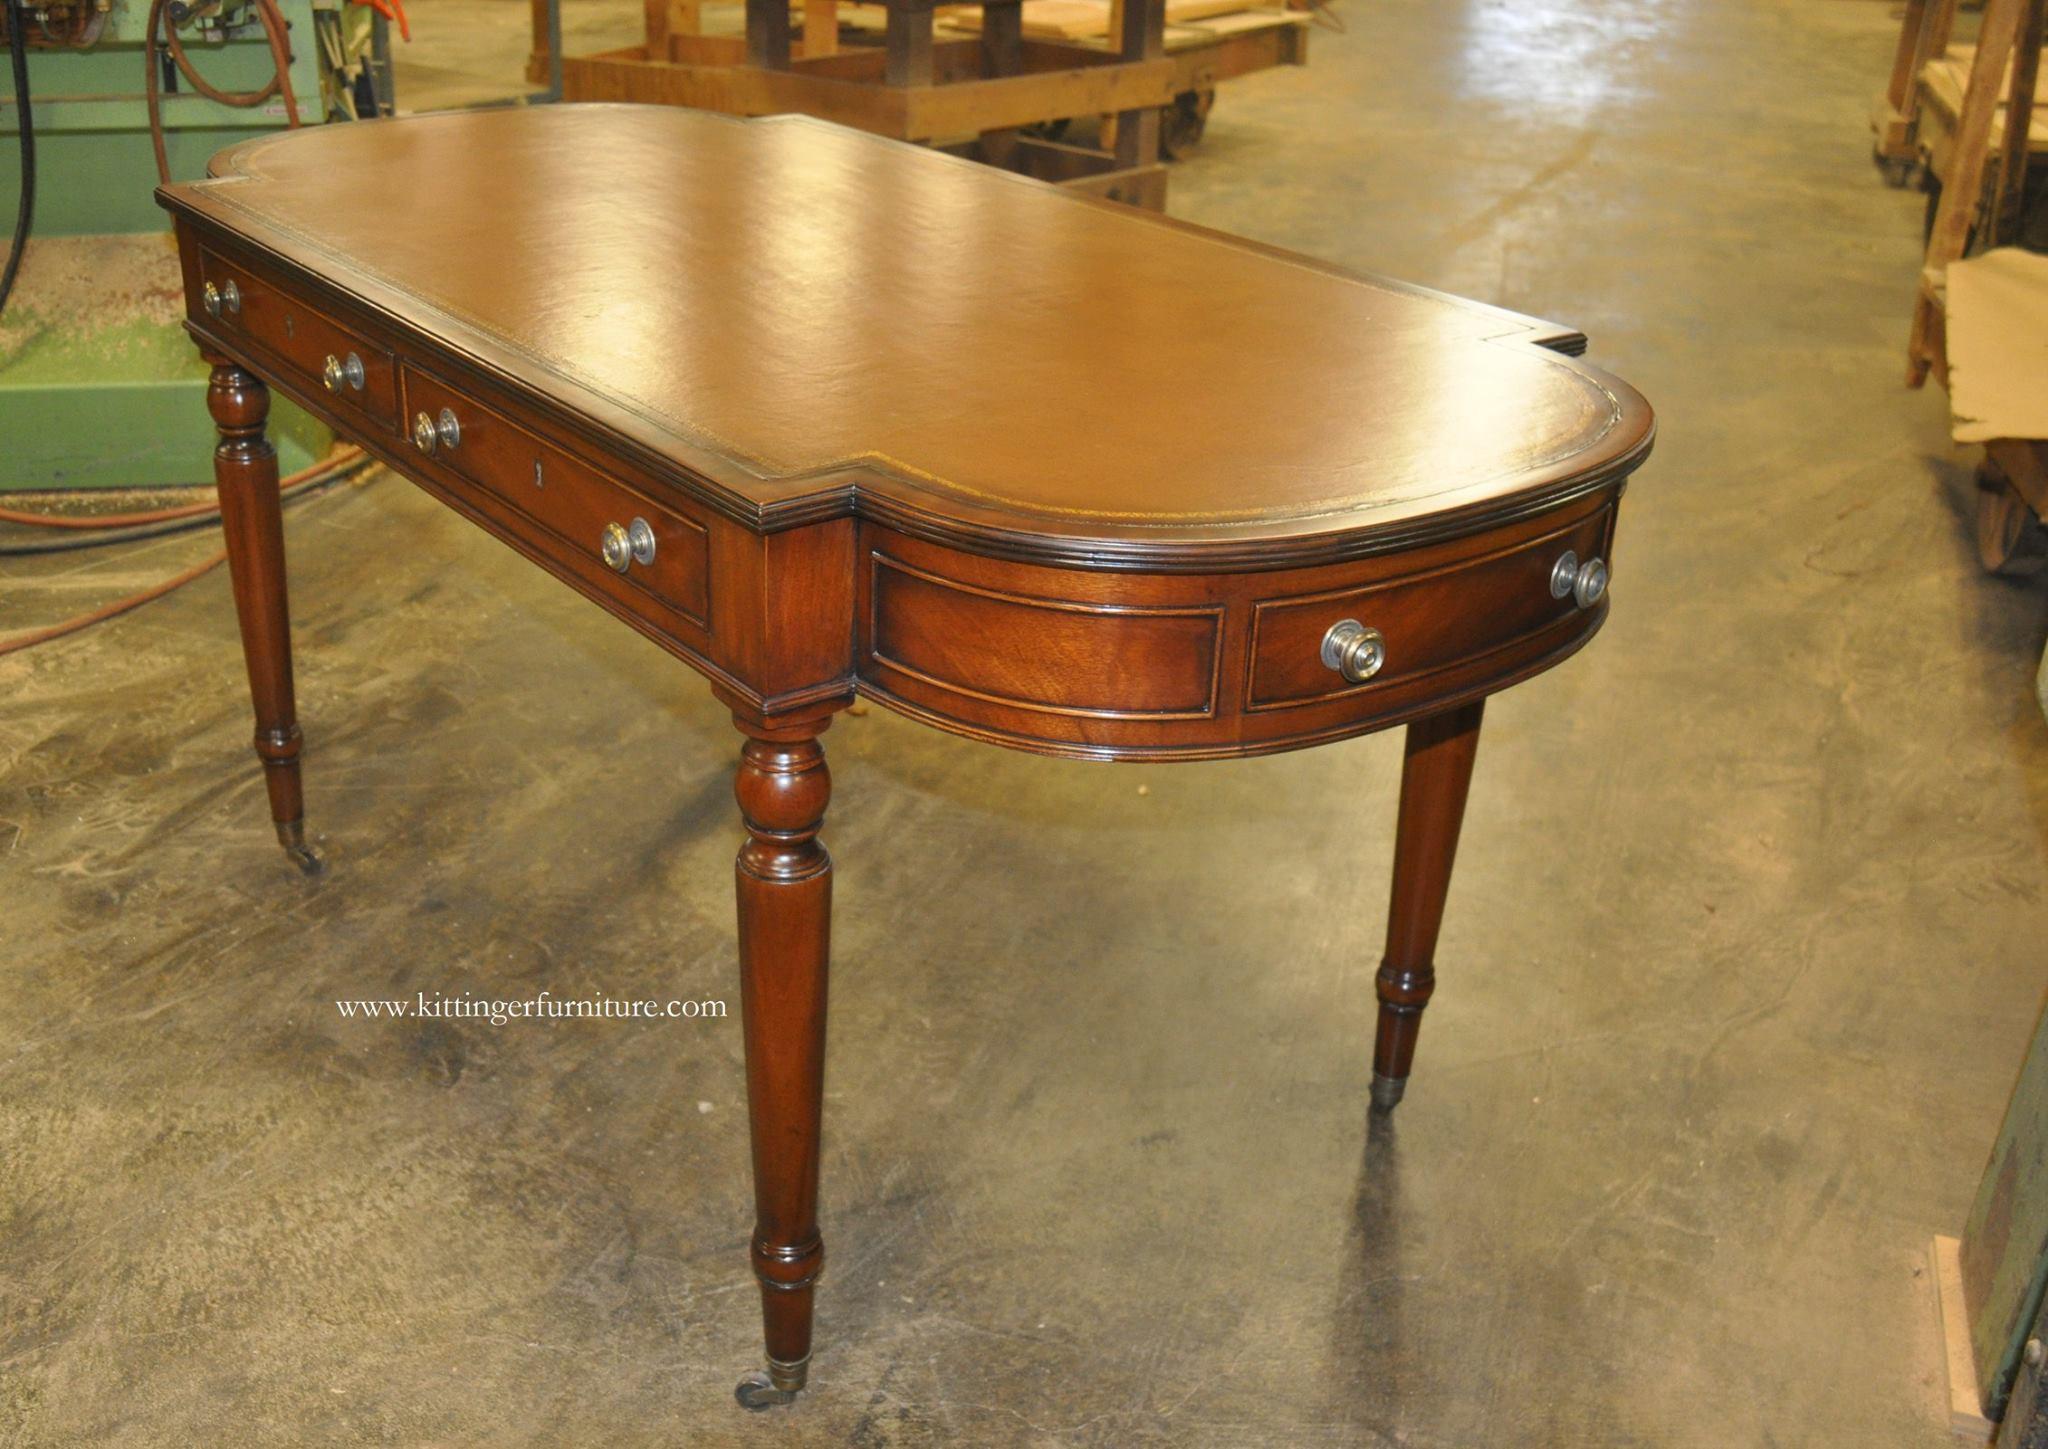 Home Kittinger Furniture Company Inc